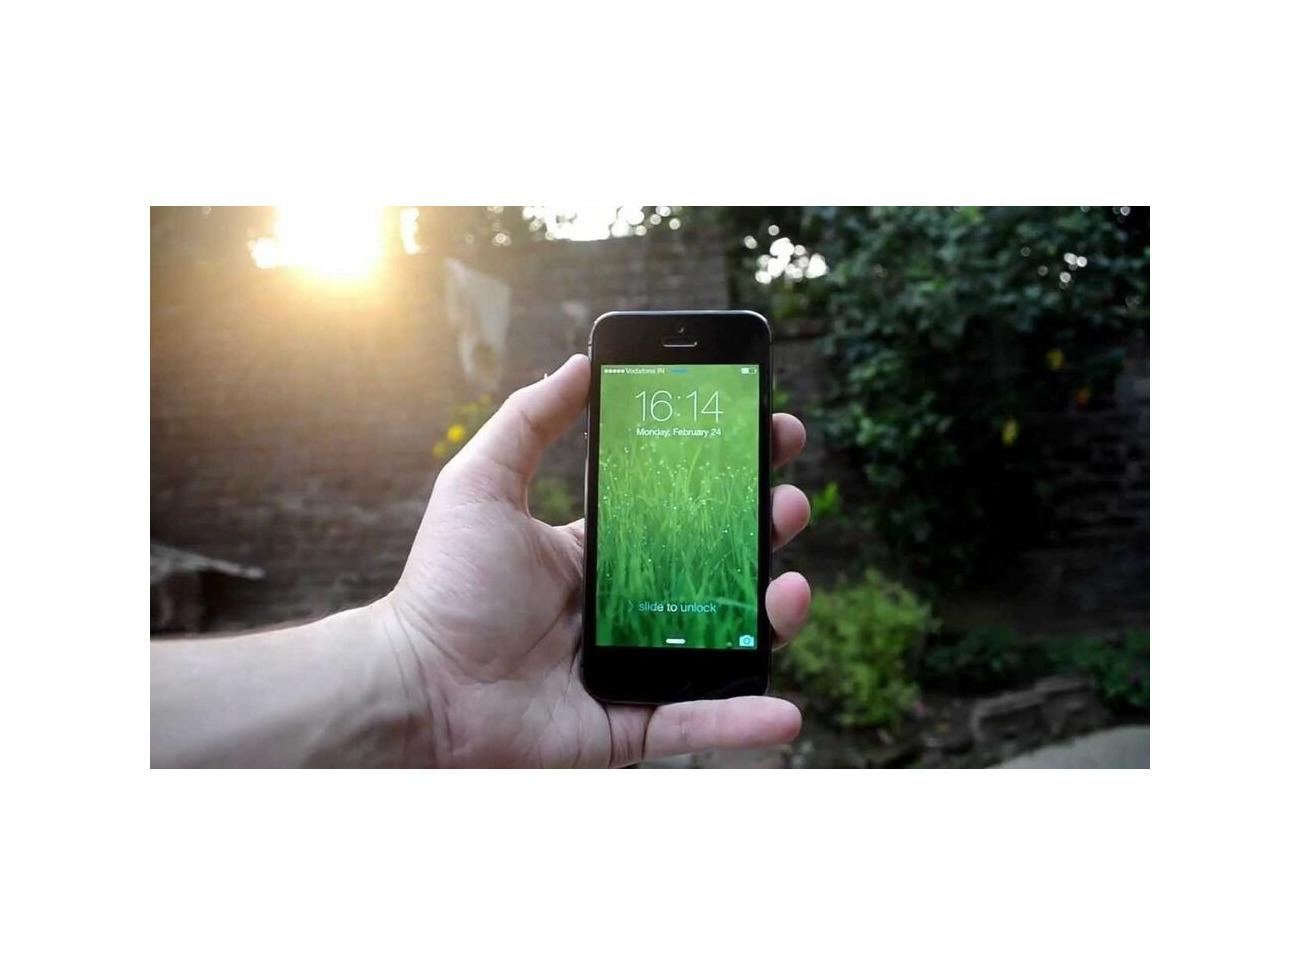 Buy Apple iPhone 5s - 16GB 32gb 64gb - Unlocked SIM Free